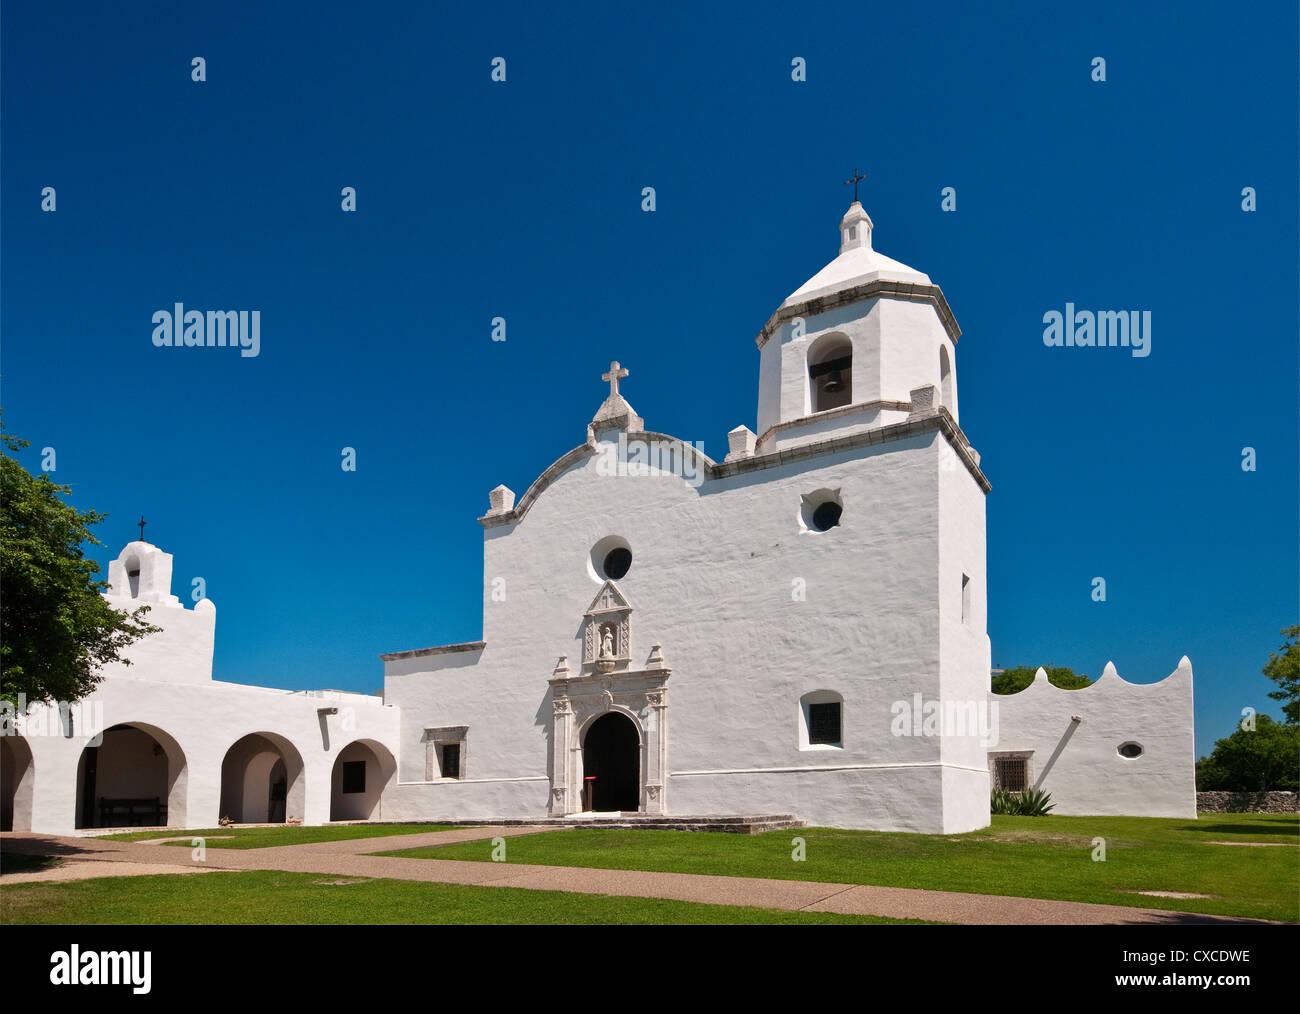 Church at Mission Espiritu Santo, Goliad State Park, near Goliad, Texas, USA - Stock Image